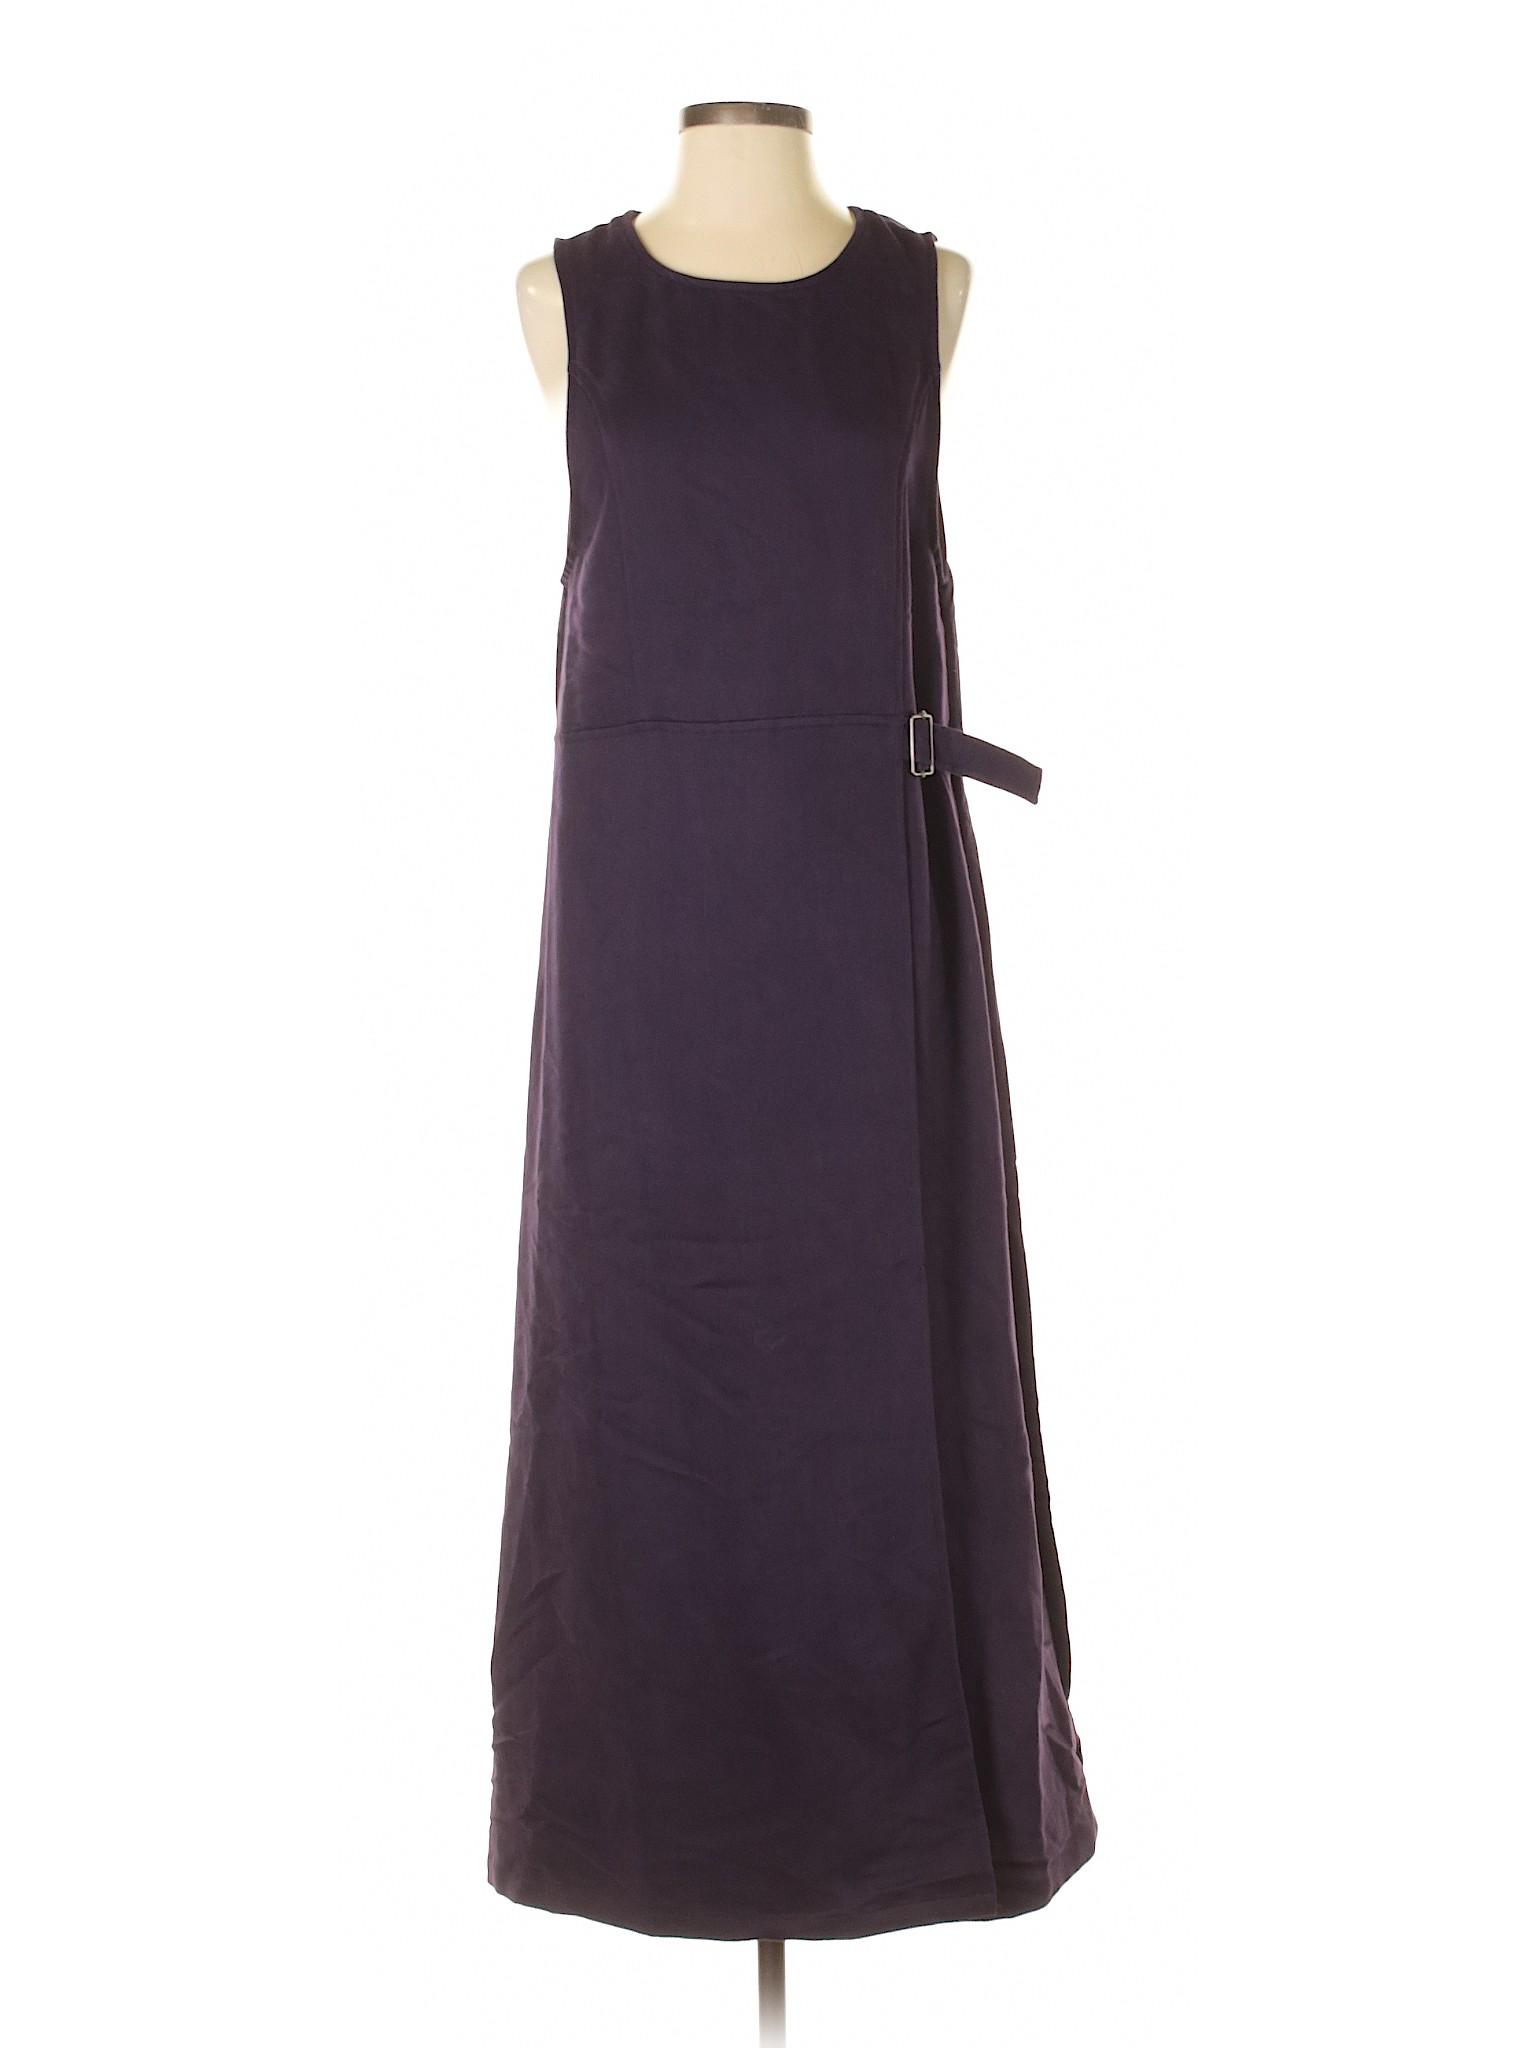 International Casual Dress Premier Premier Dress Selling International Selling Casual q7UBfg